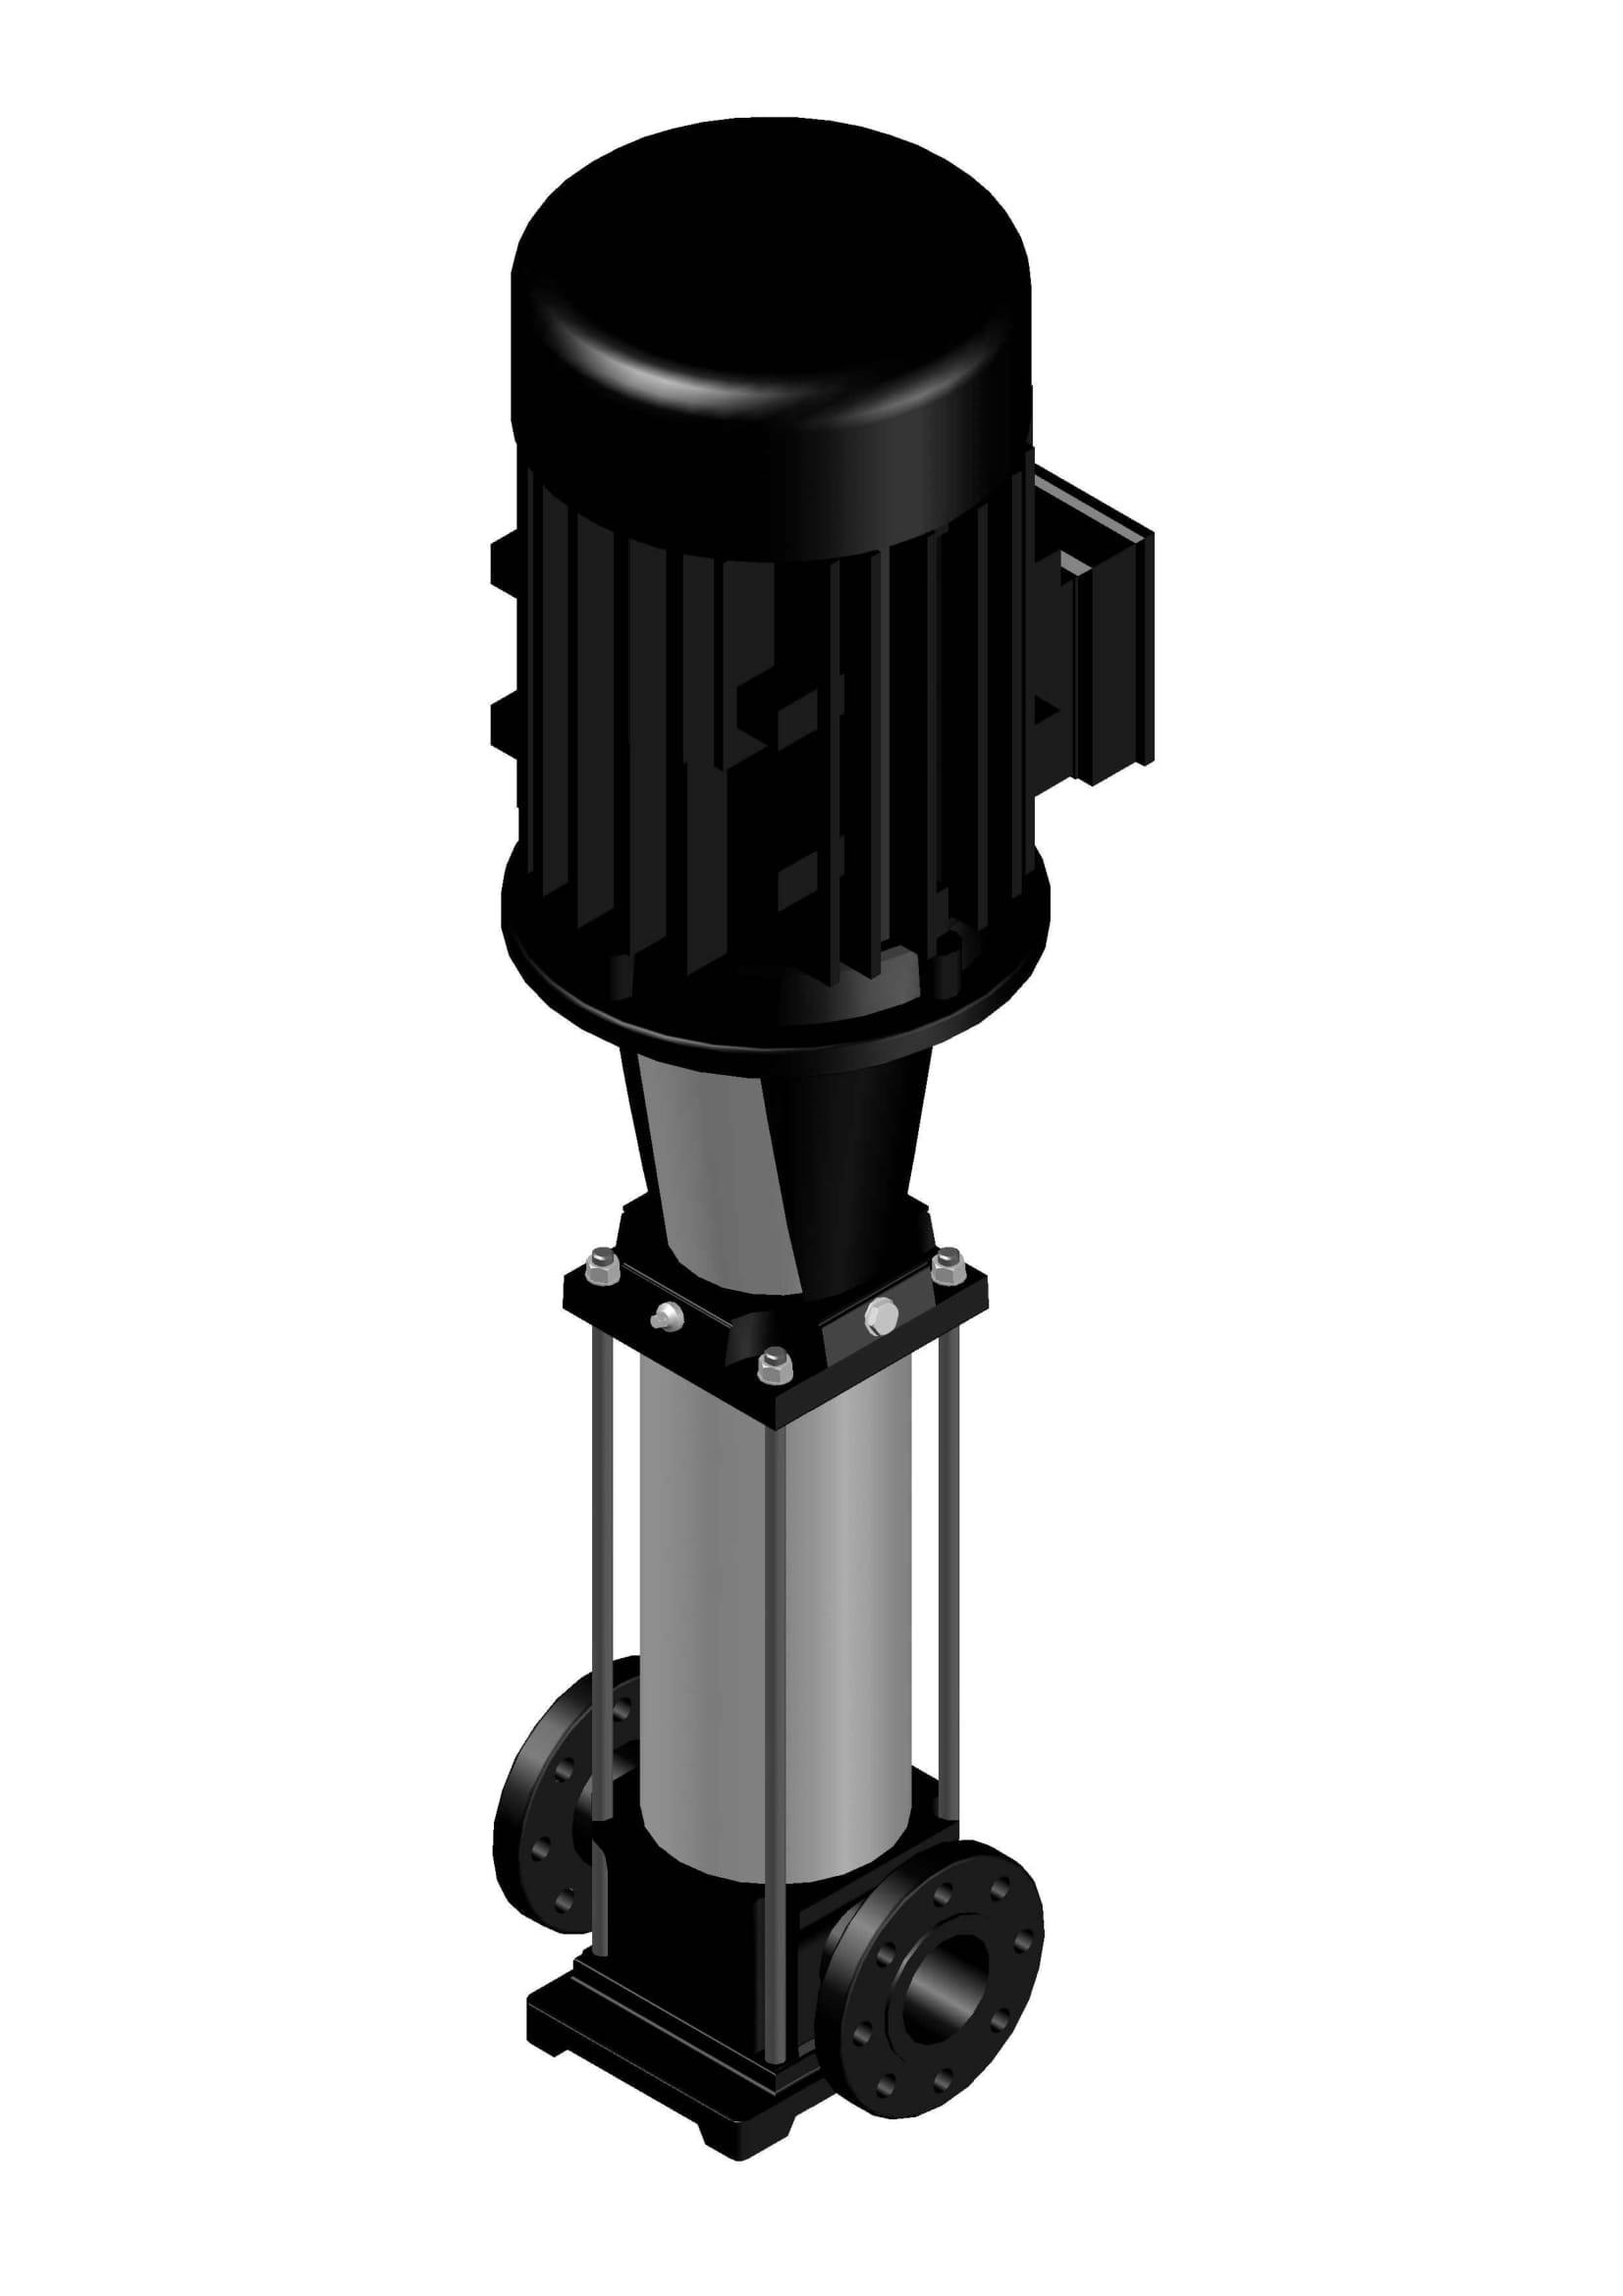 BV 64-06